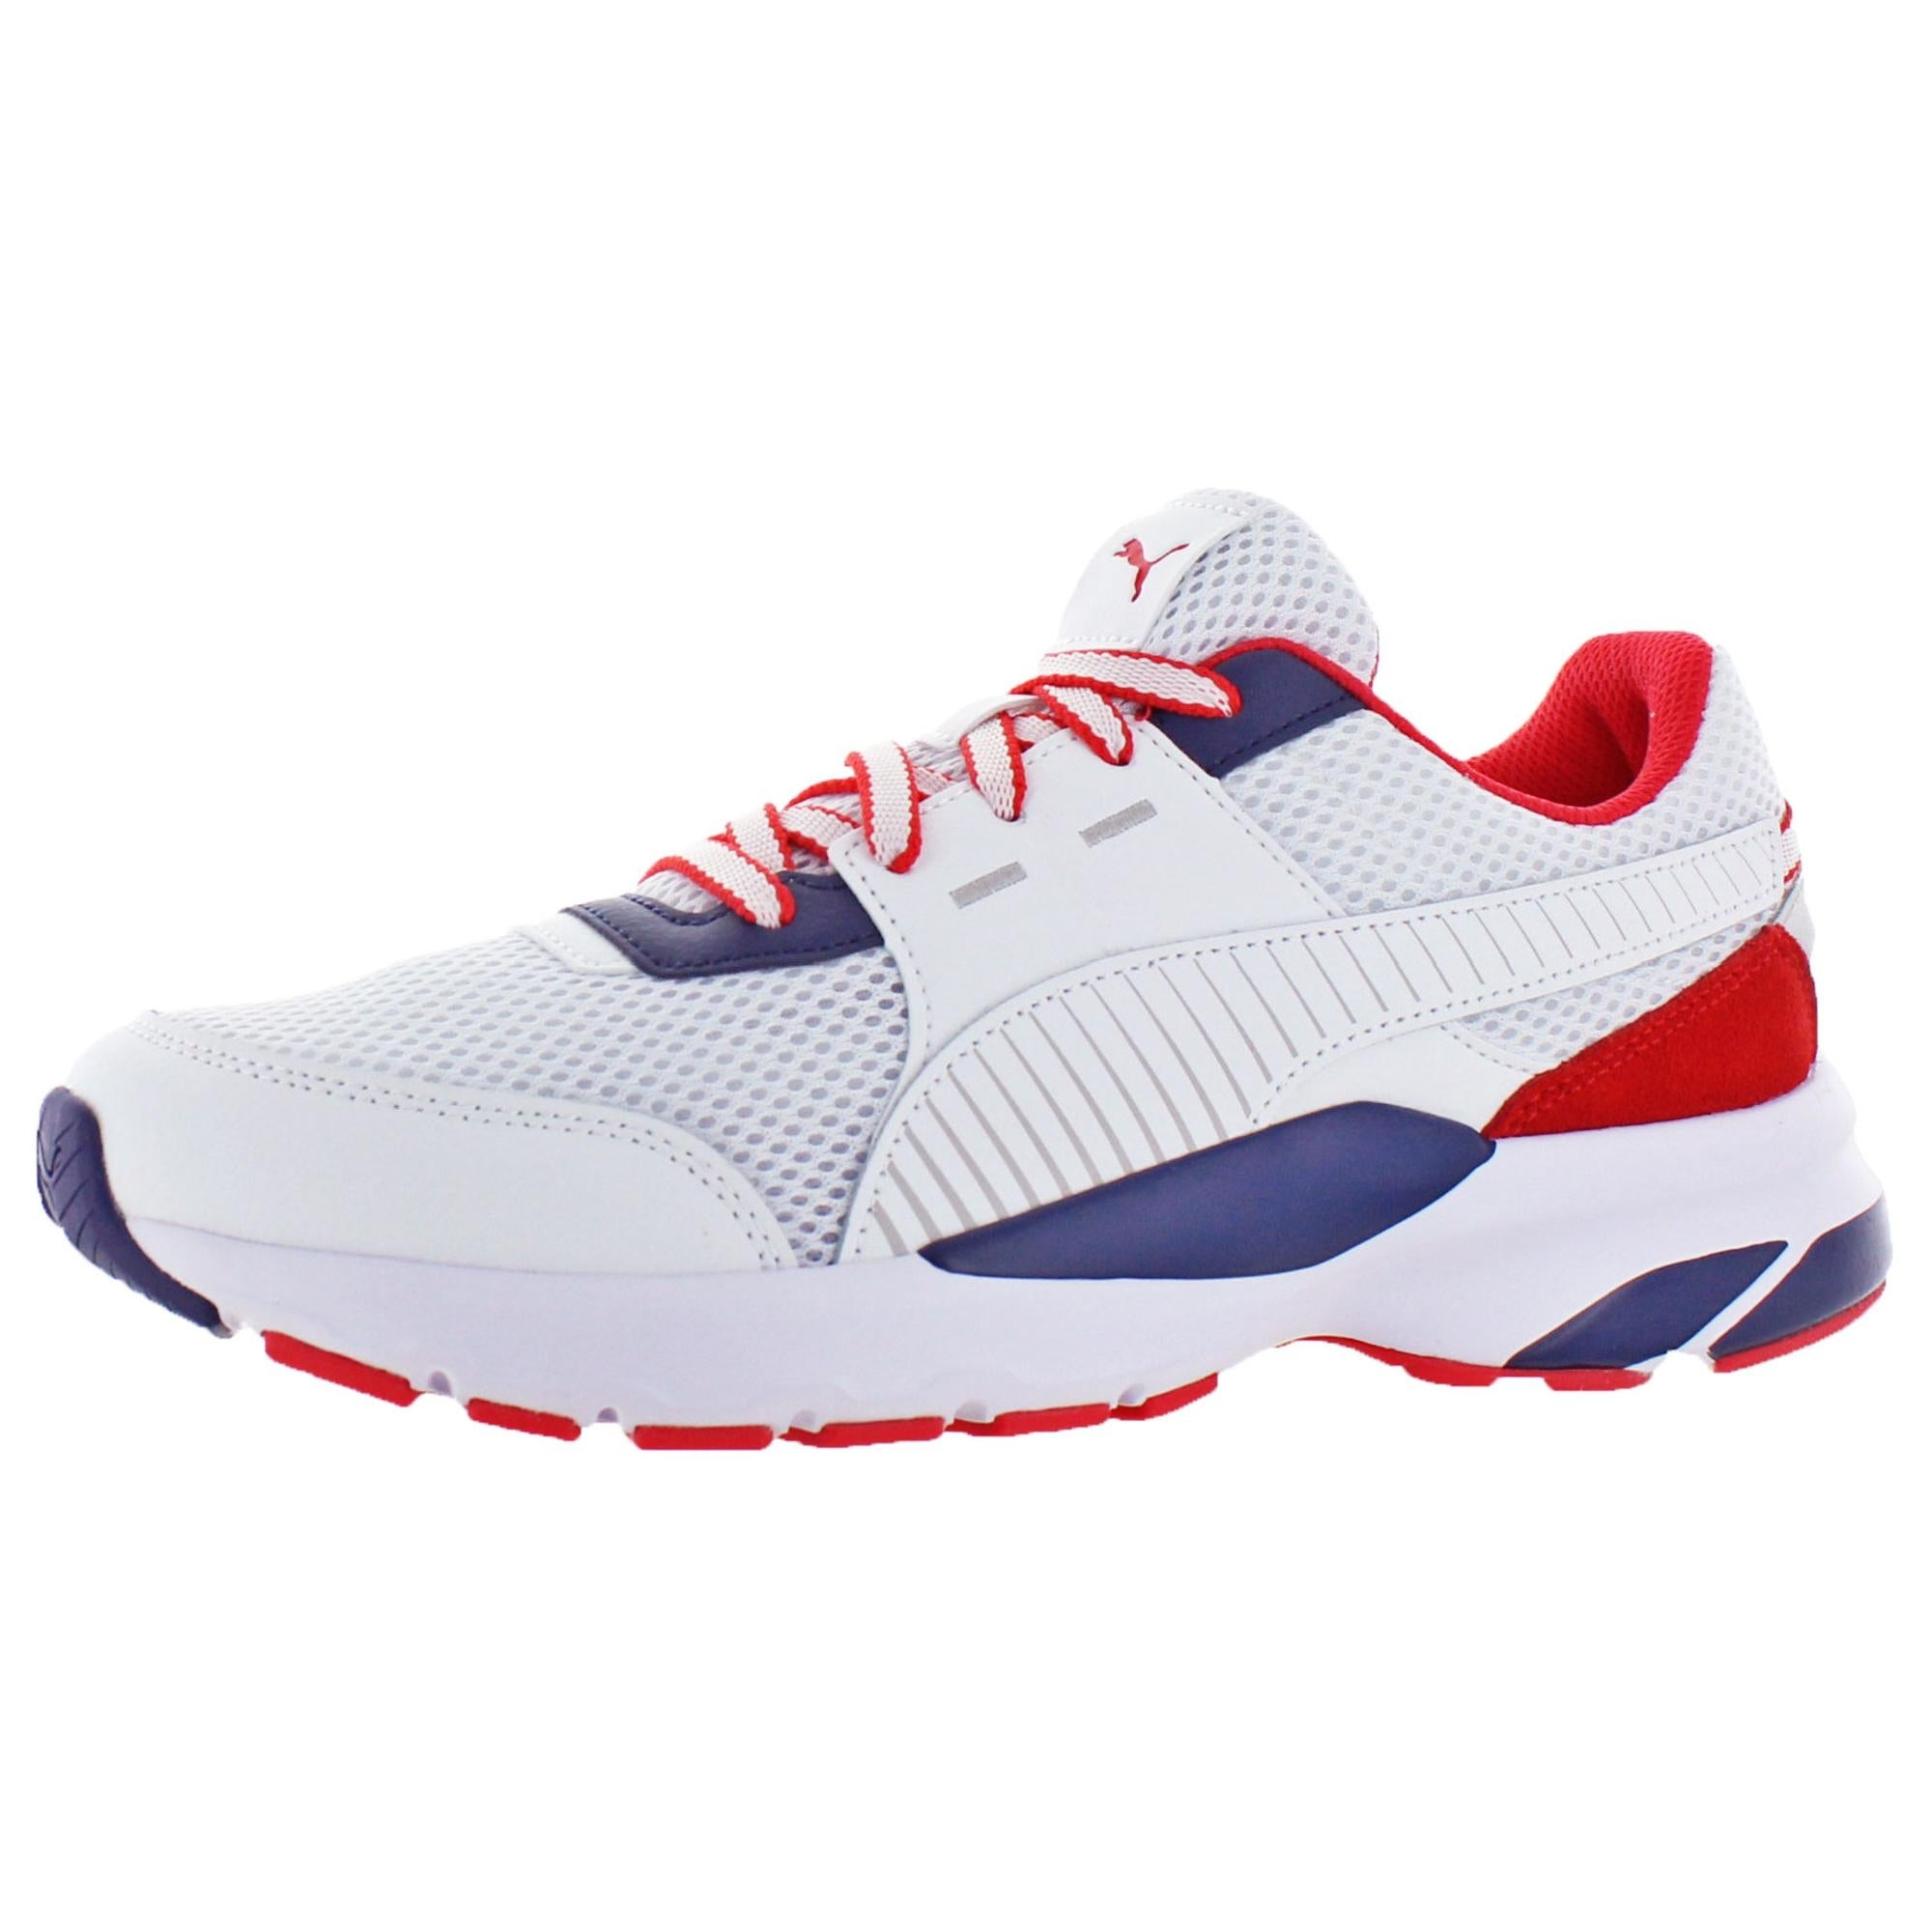 shop puma men s future runner men s retro 90 s dad sneaker trainers overstock 27102859 puma men s future runner men s retro 90 s dad sneaker trainers